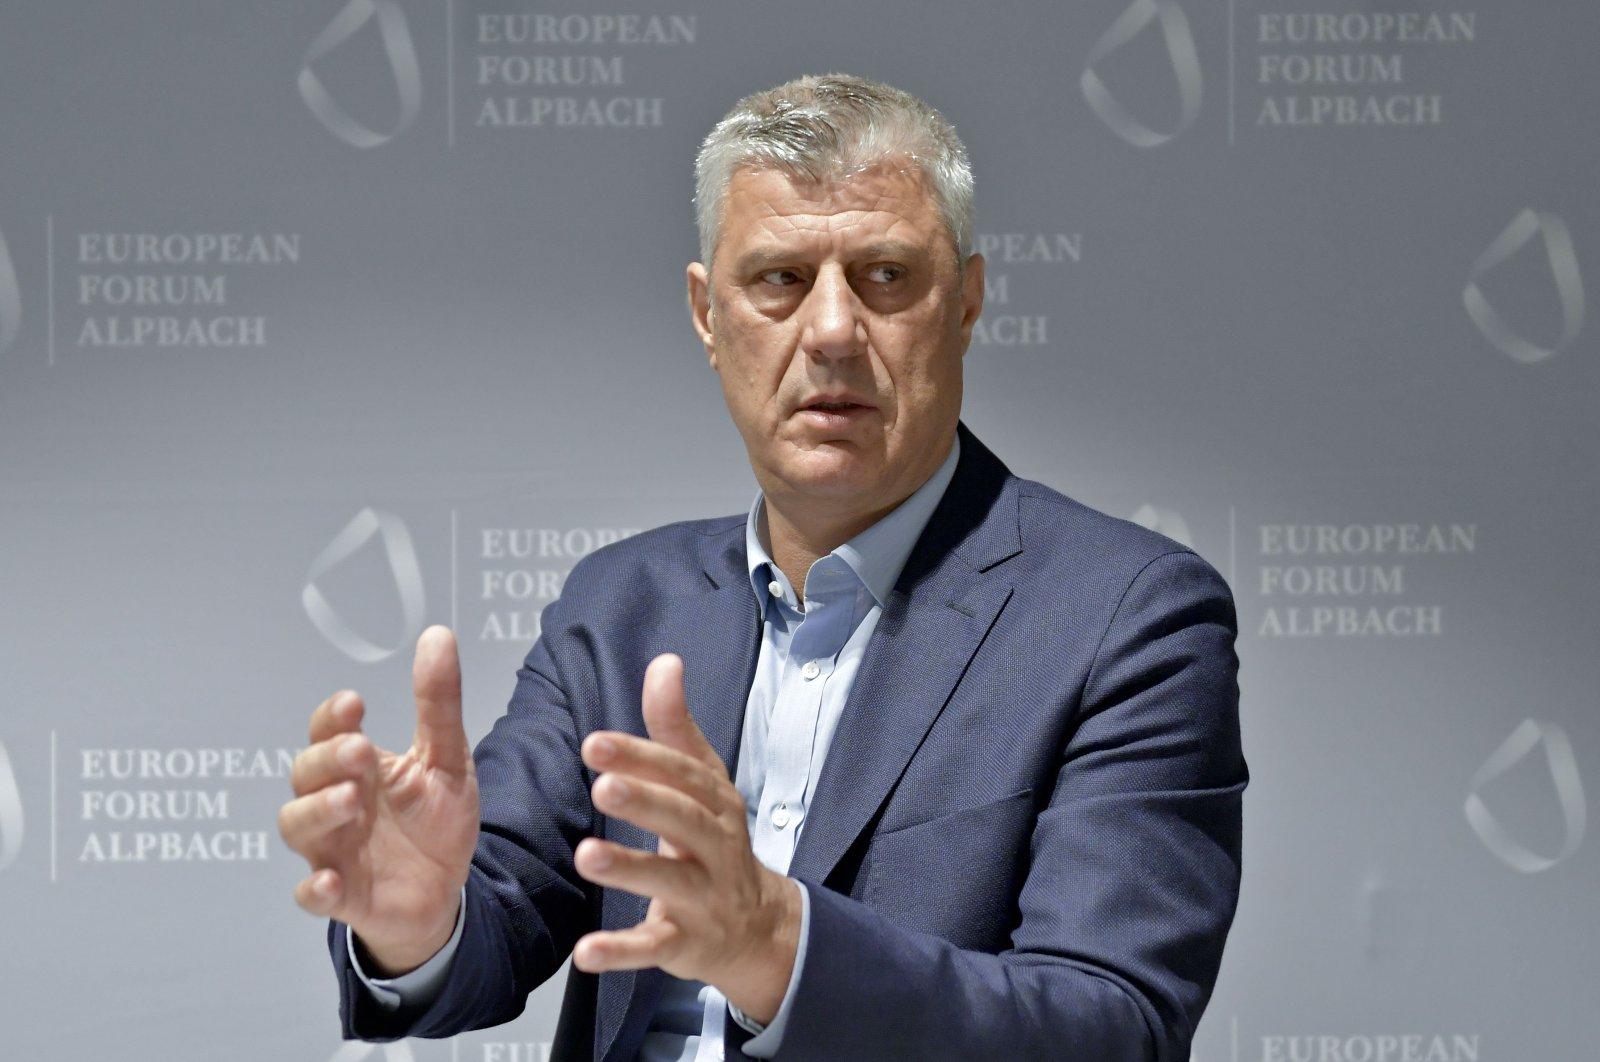 Kosovo's President Hashim Thaci gestures during an interview at the European Forum Alpbach 2018 on Aug. 26, 2018, in Alpbach, Austria. (AFP Photo)